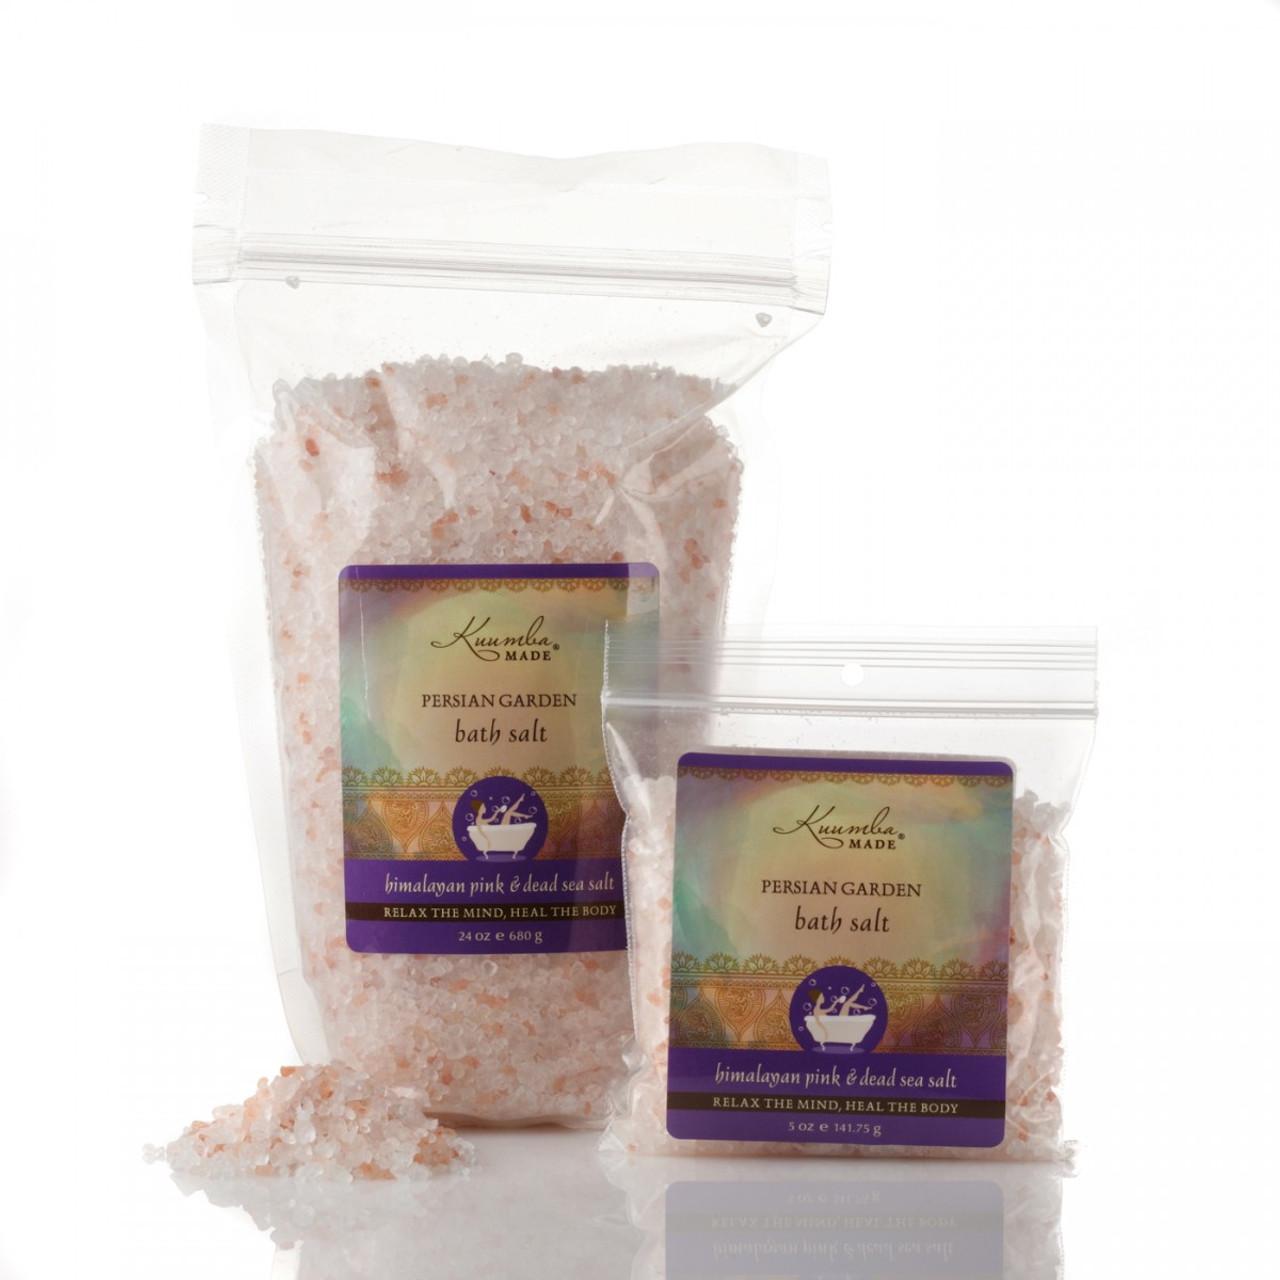 Kuumba Made Persian Garden Bath Salt